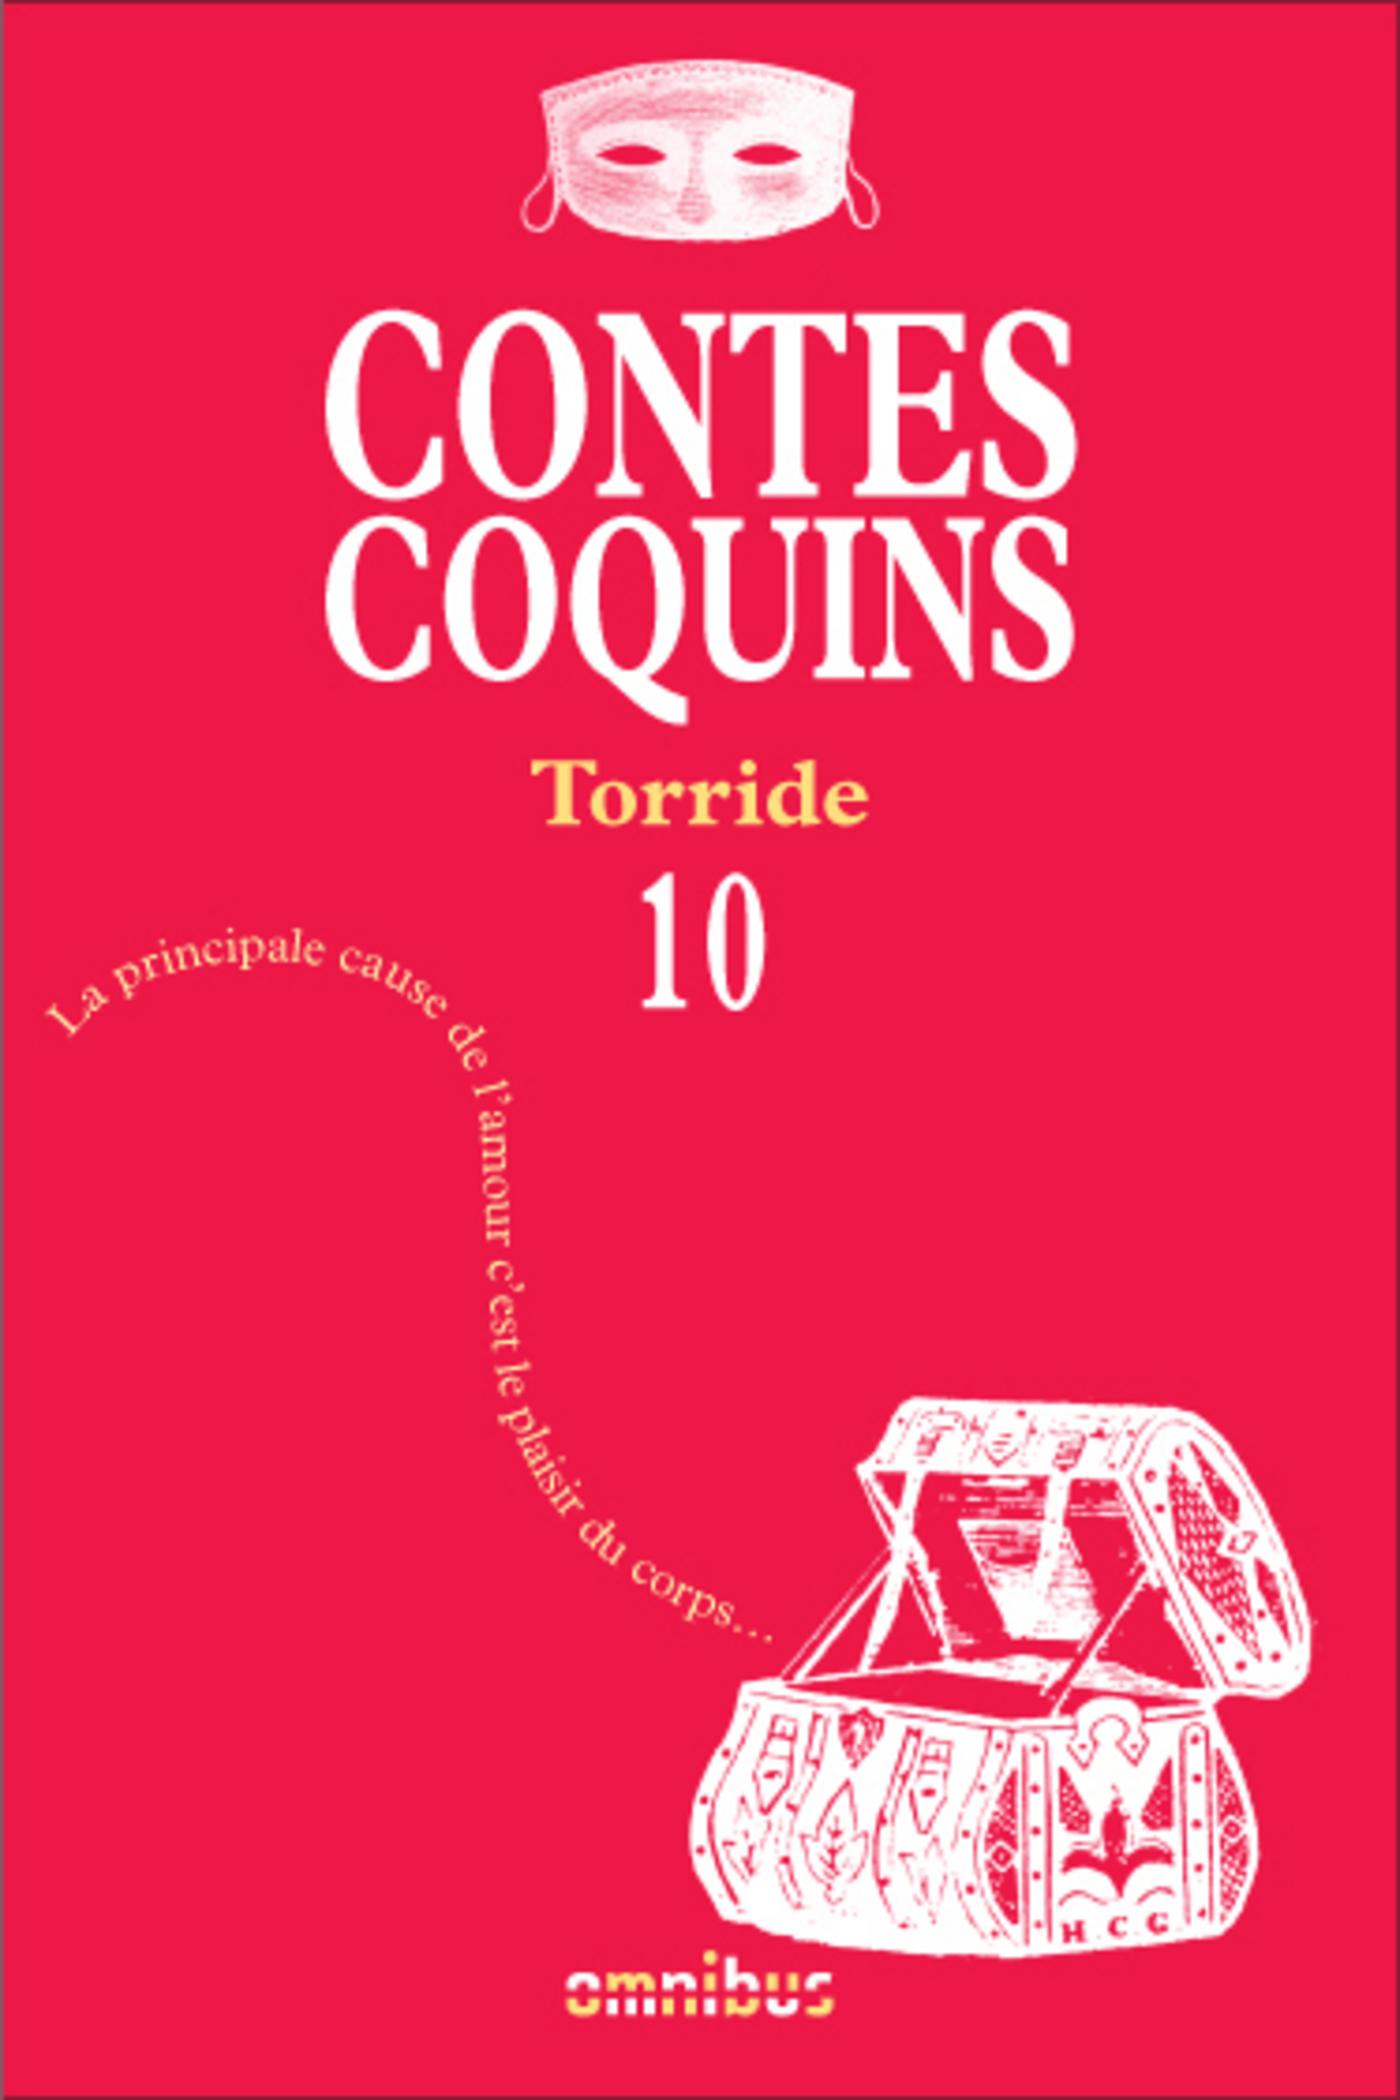 Contes coquins 10 - Torride